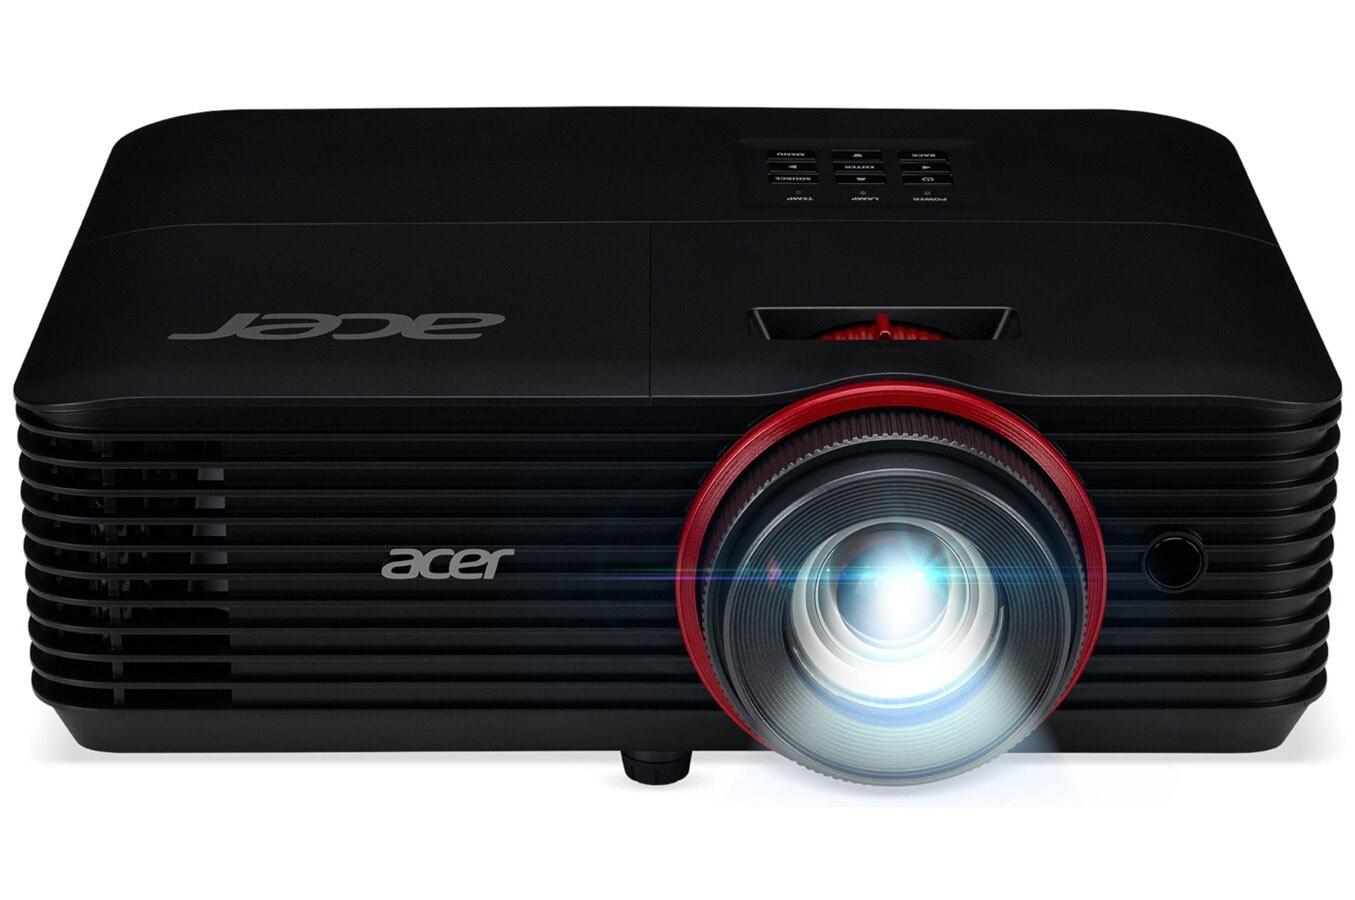 Vidéoprojecteur Acer Nitro G550 (via ODR 100) - Full HD 1080p - Compatible 4K HDR